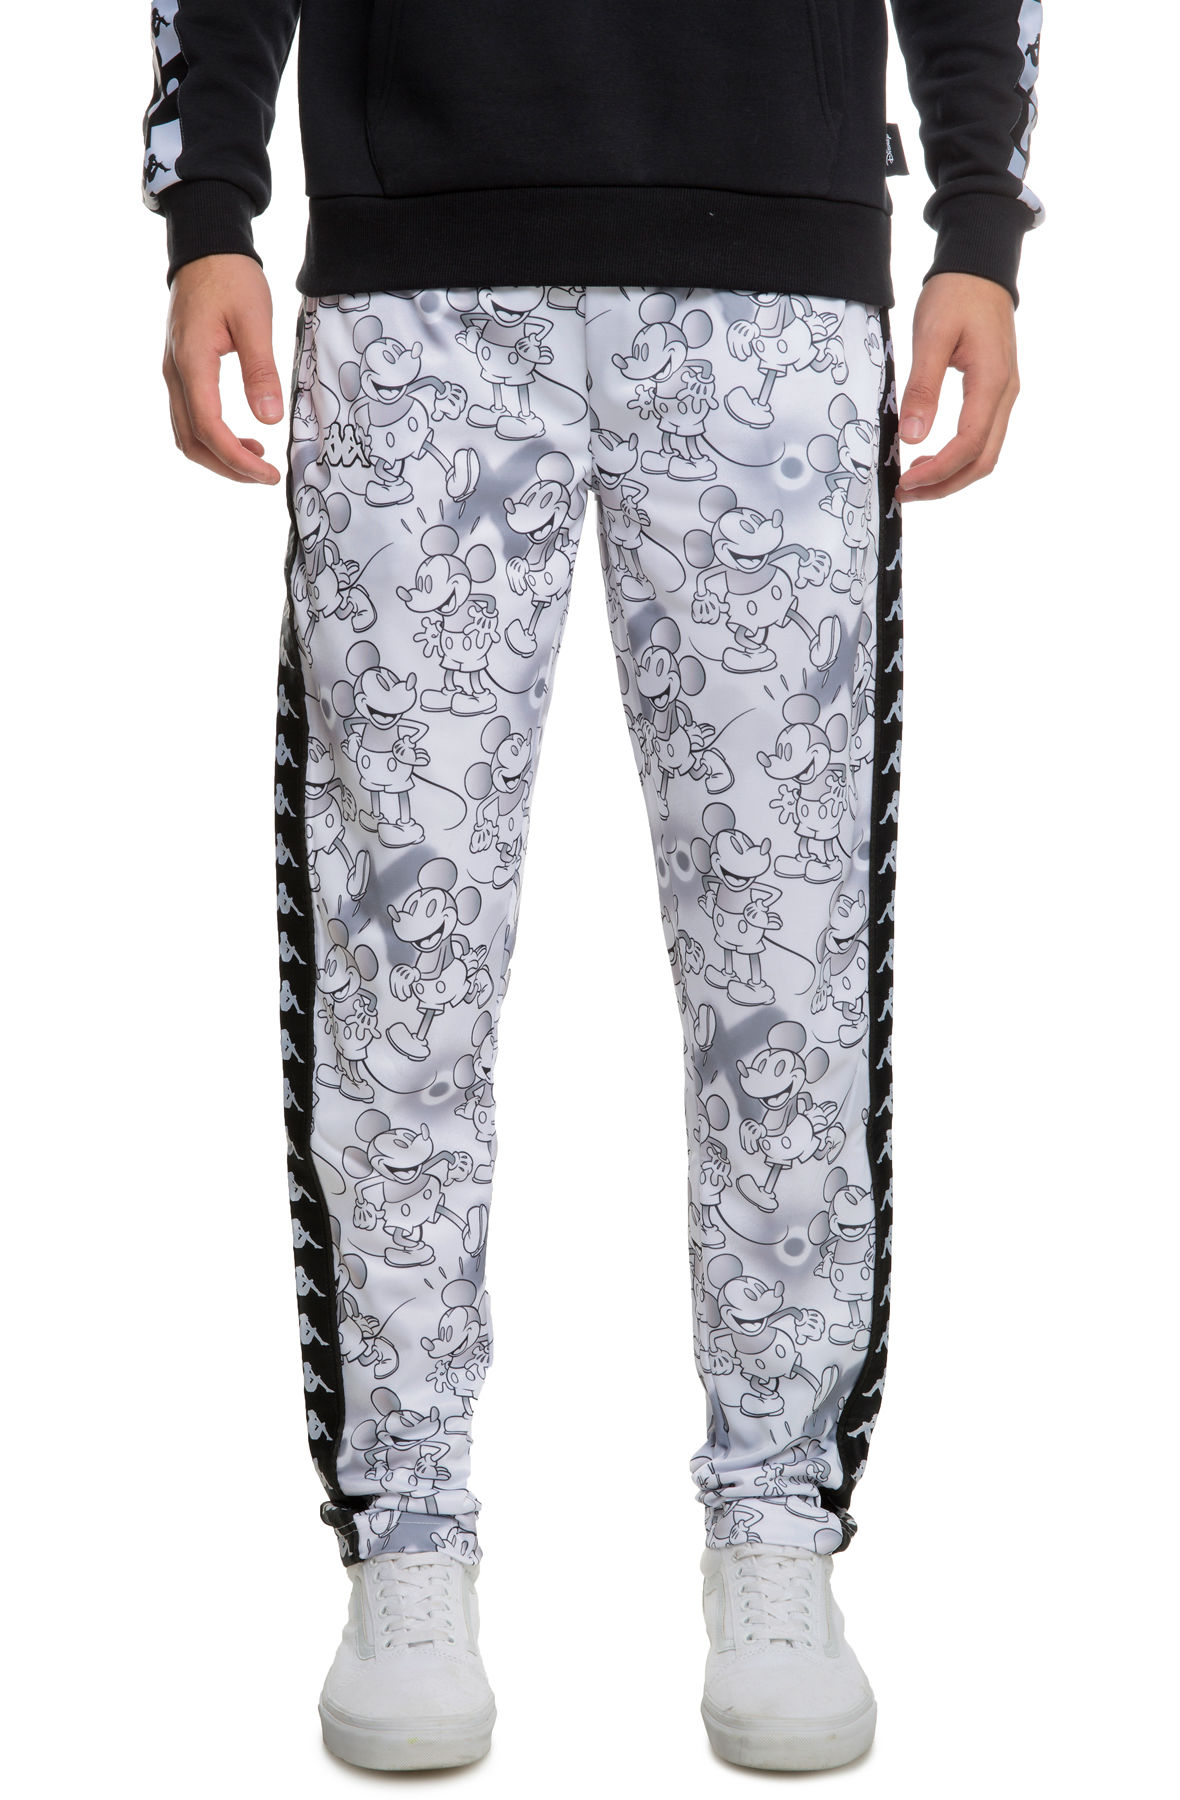 Image of The 222 Banda Astoria Disney Pants in White